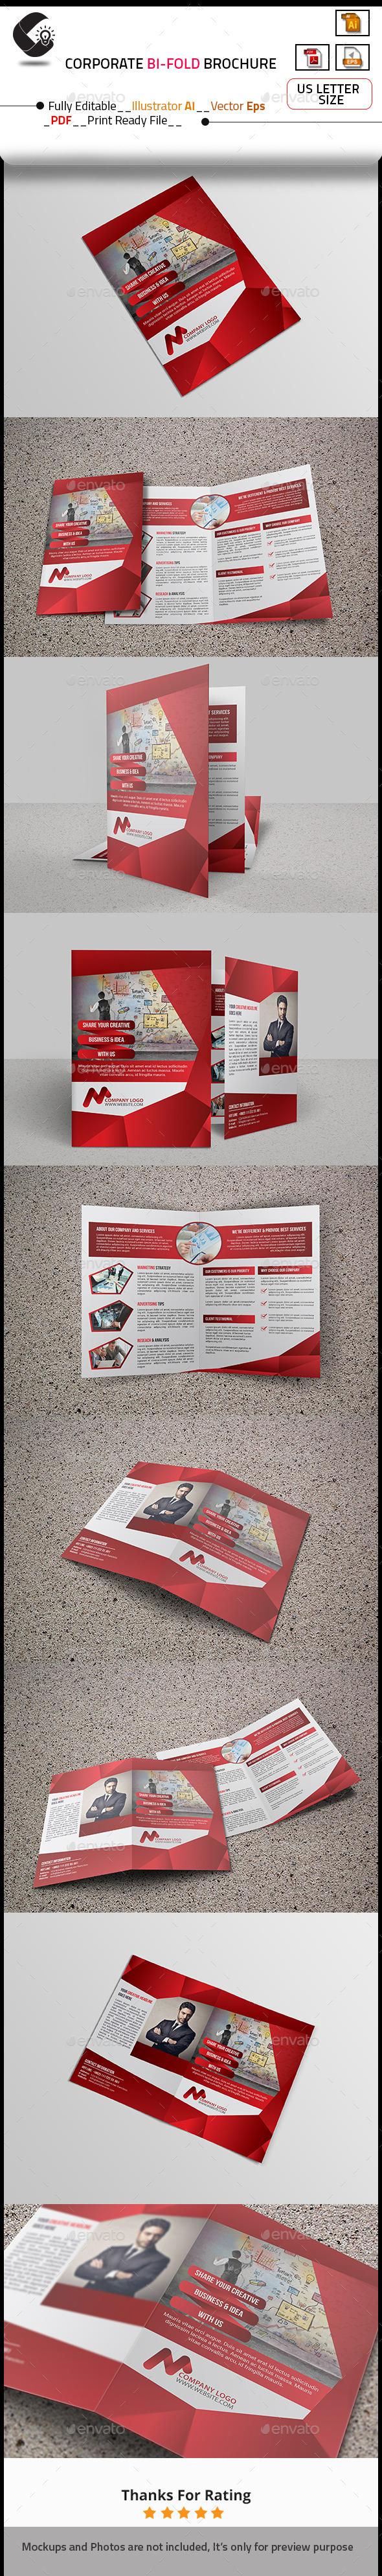 GraphicRiver Corporate Bi-Fold Brochure Template 10703843